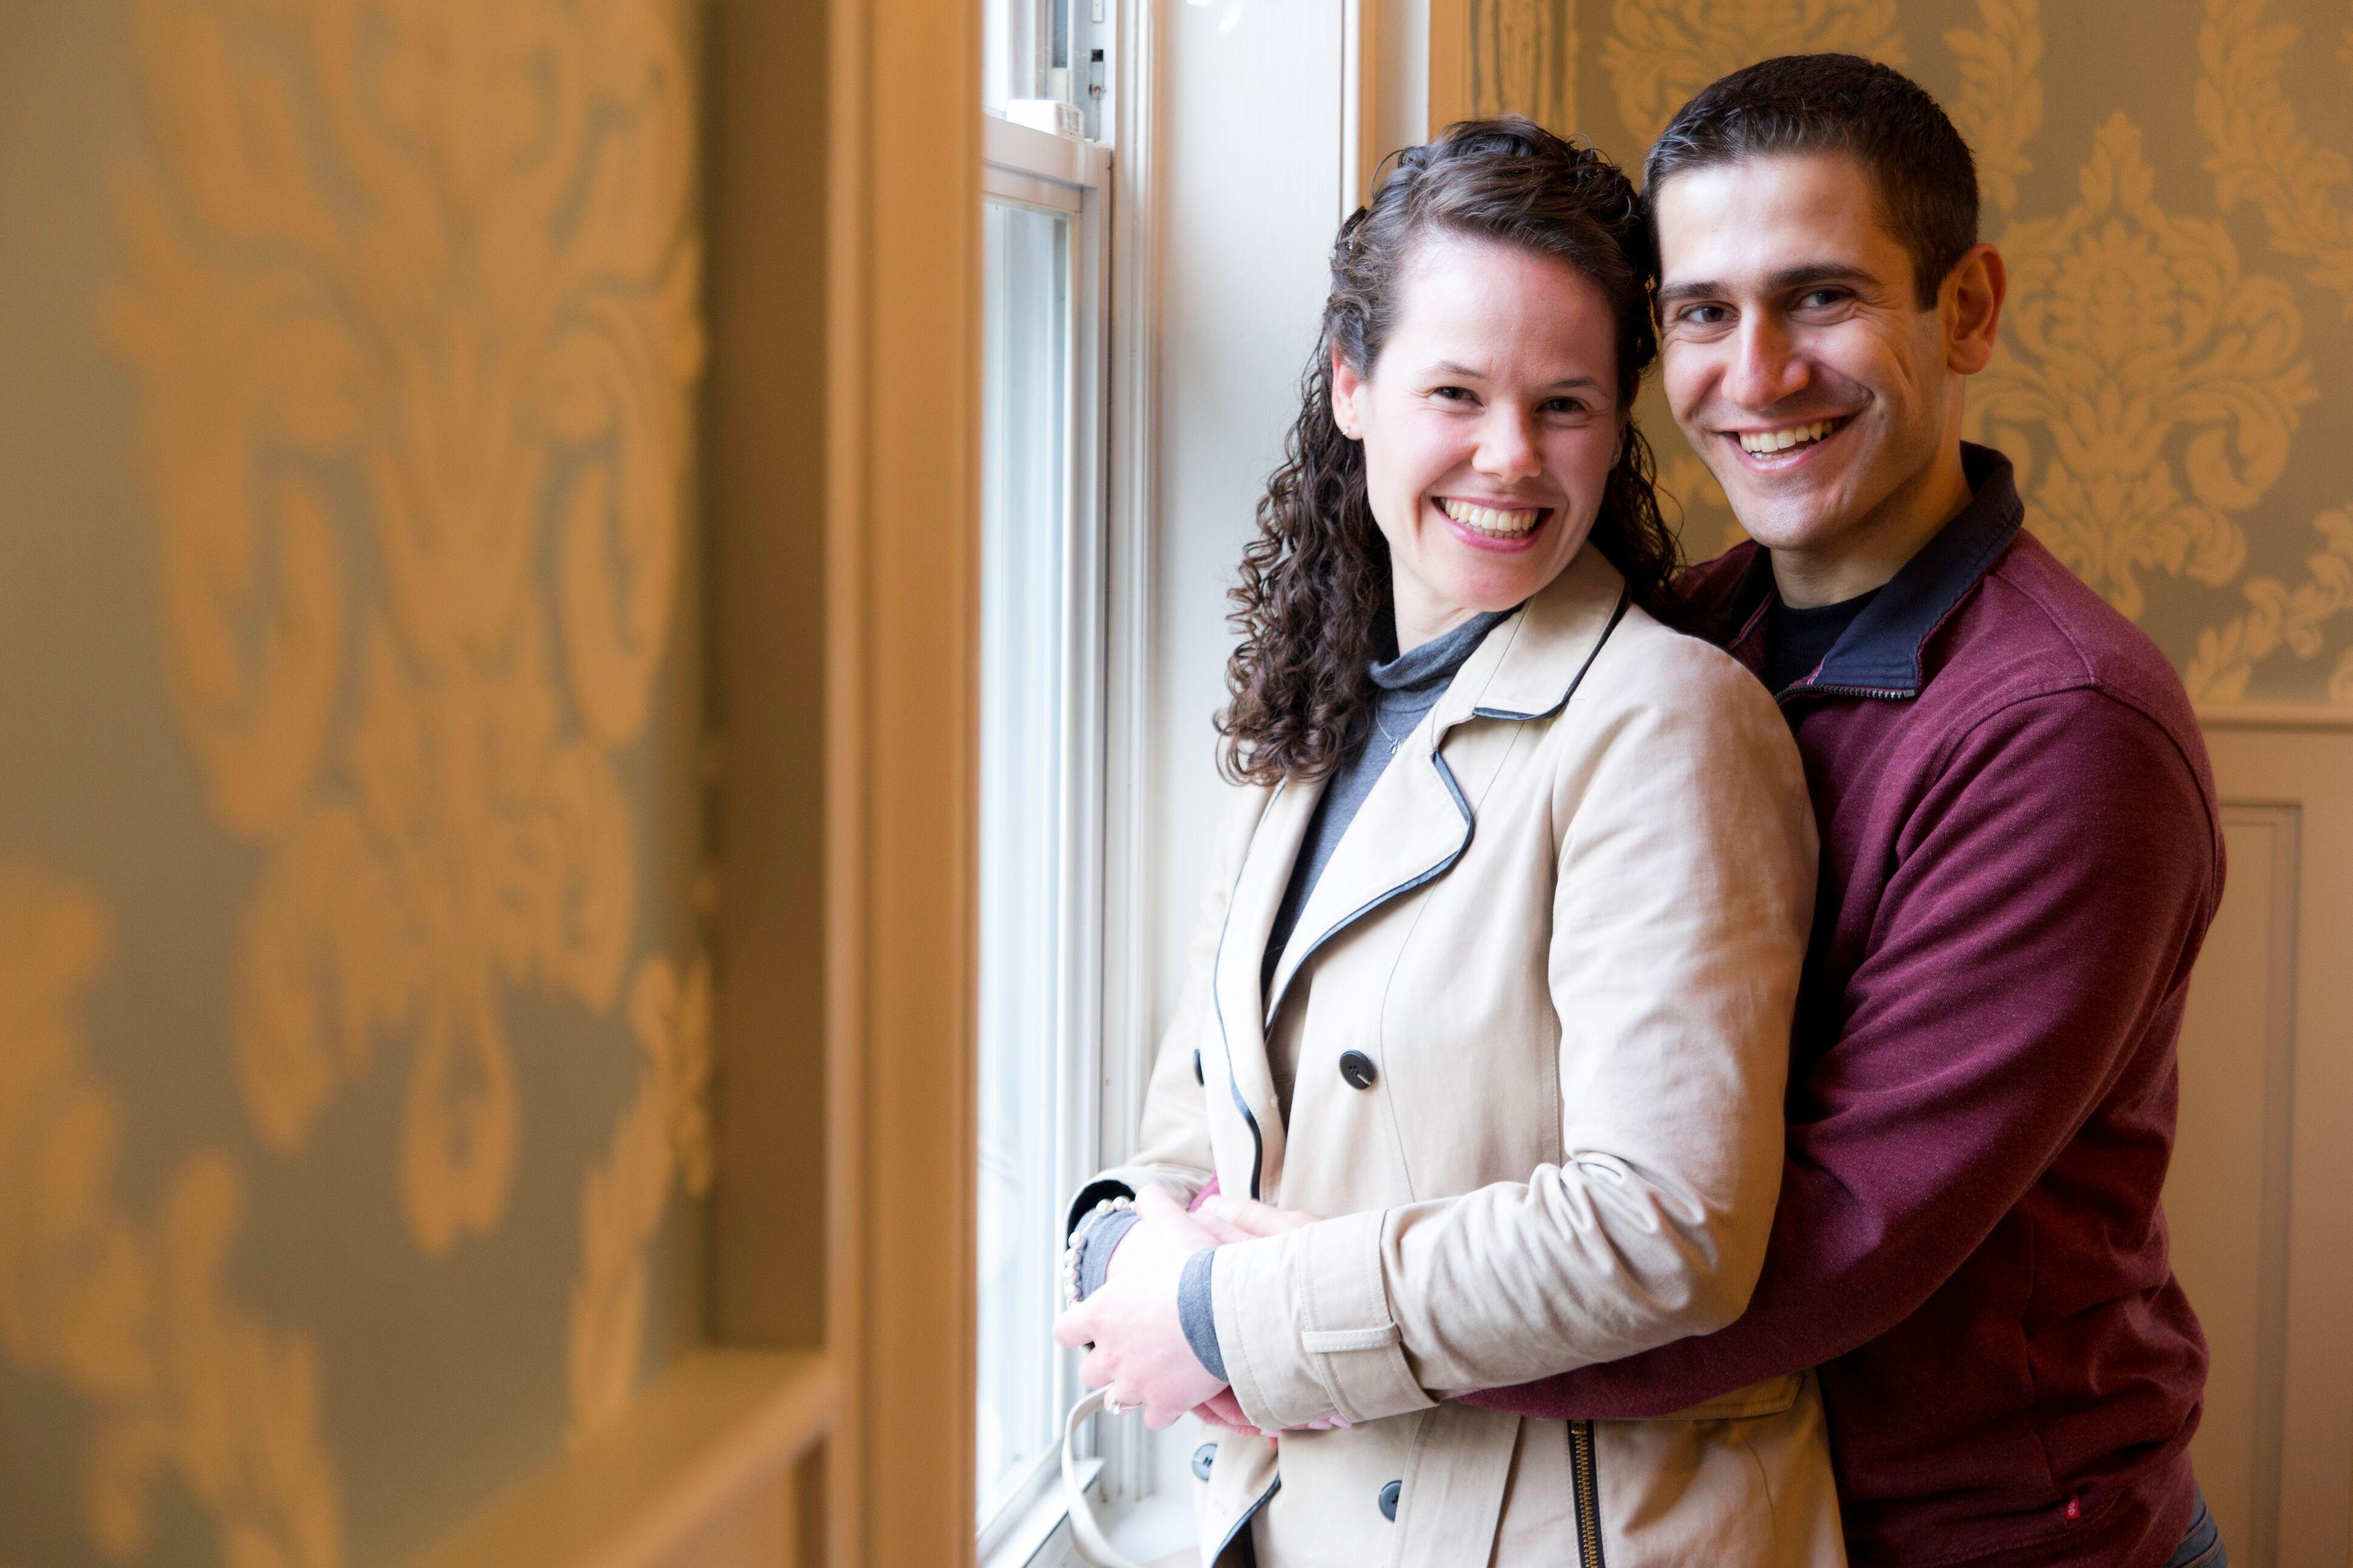 Hillary and Hagop Engagement shoot